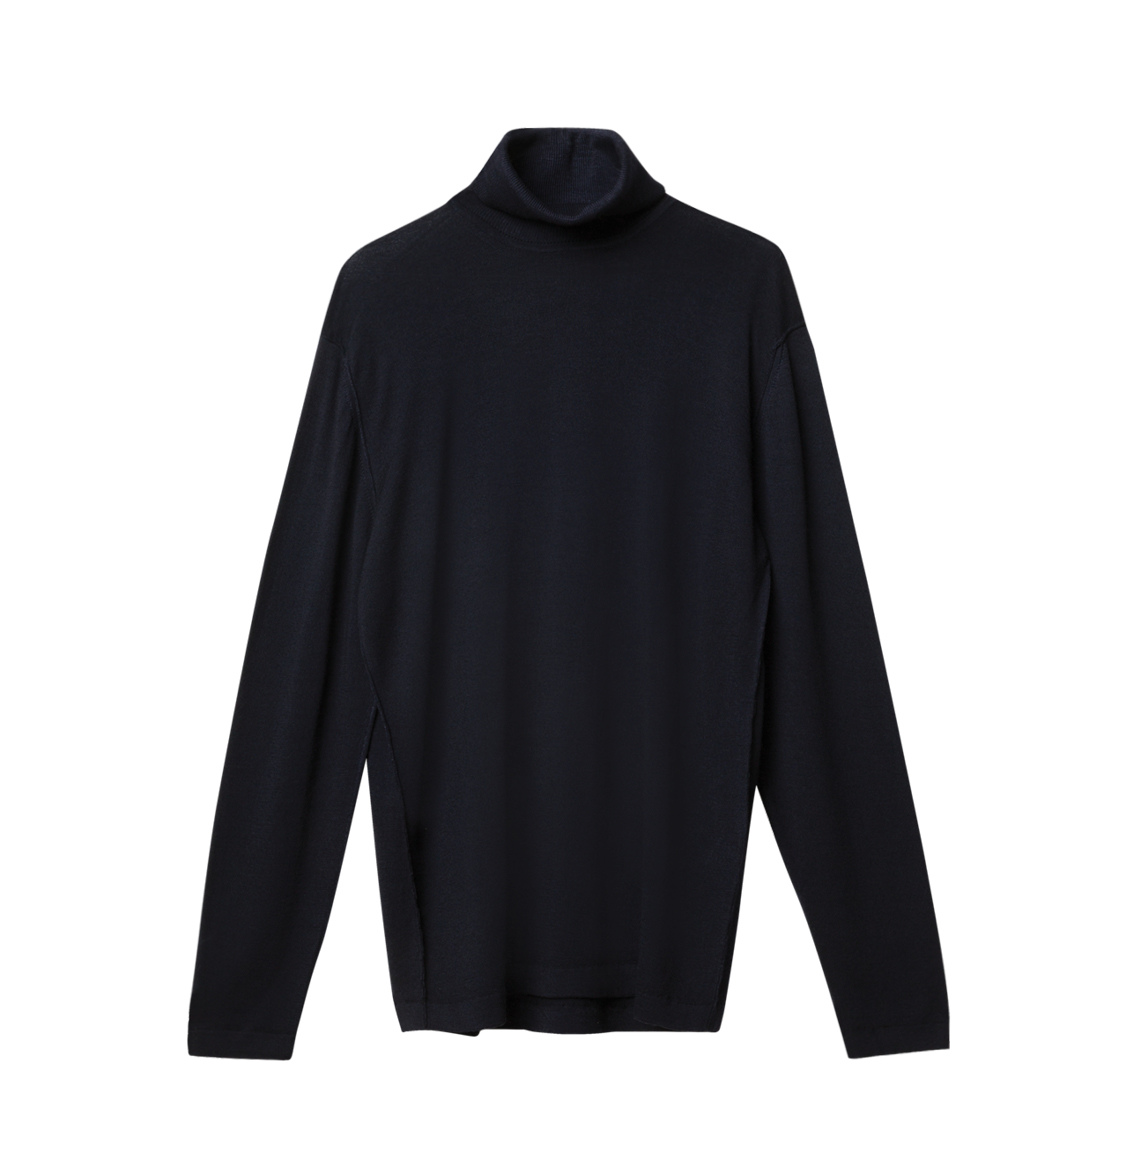 Wool Rollneck Sweater Navy Blue